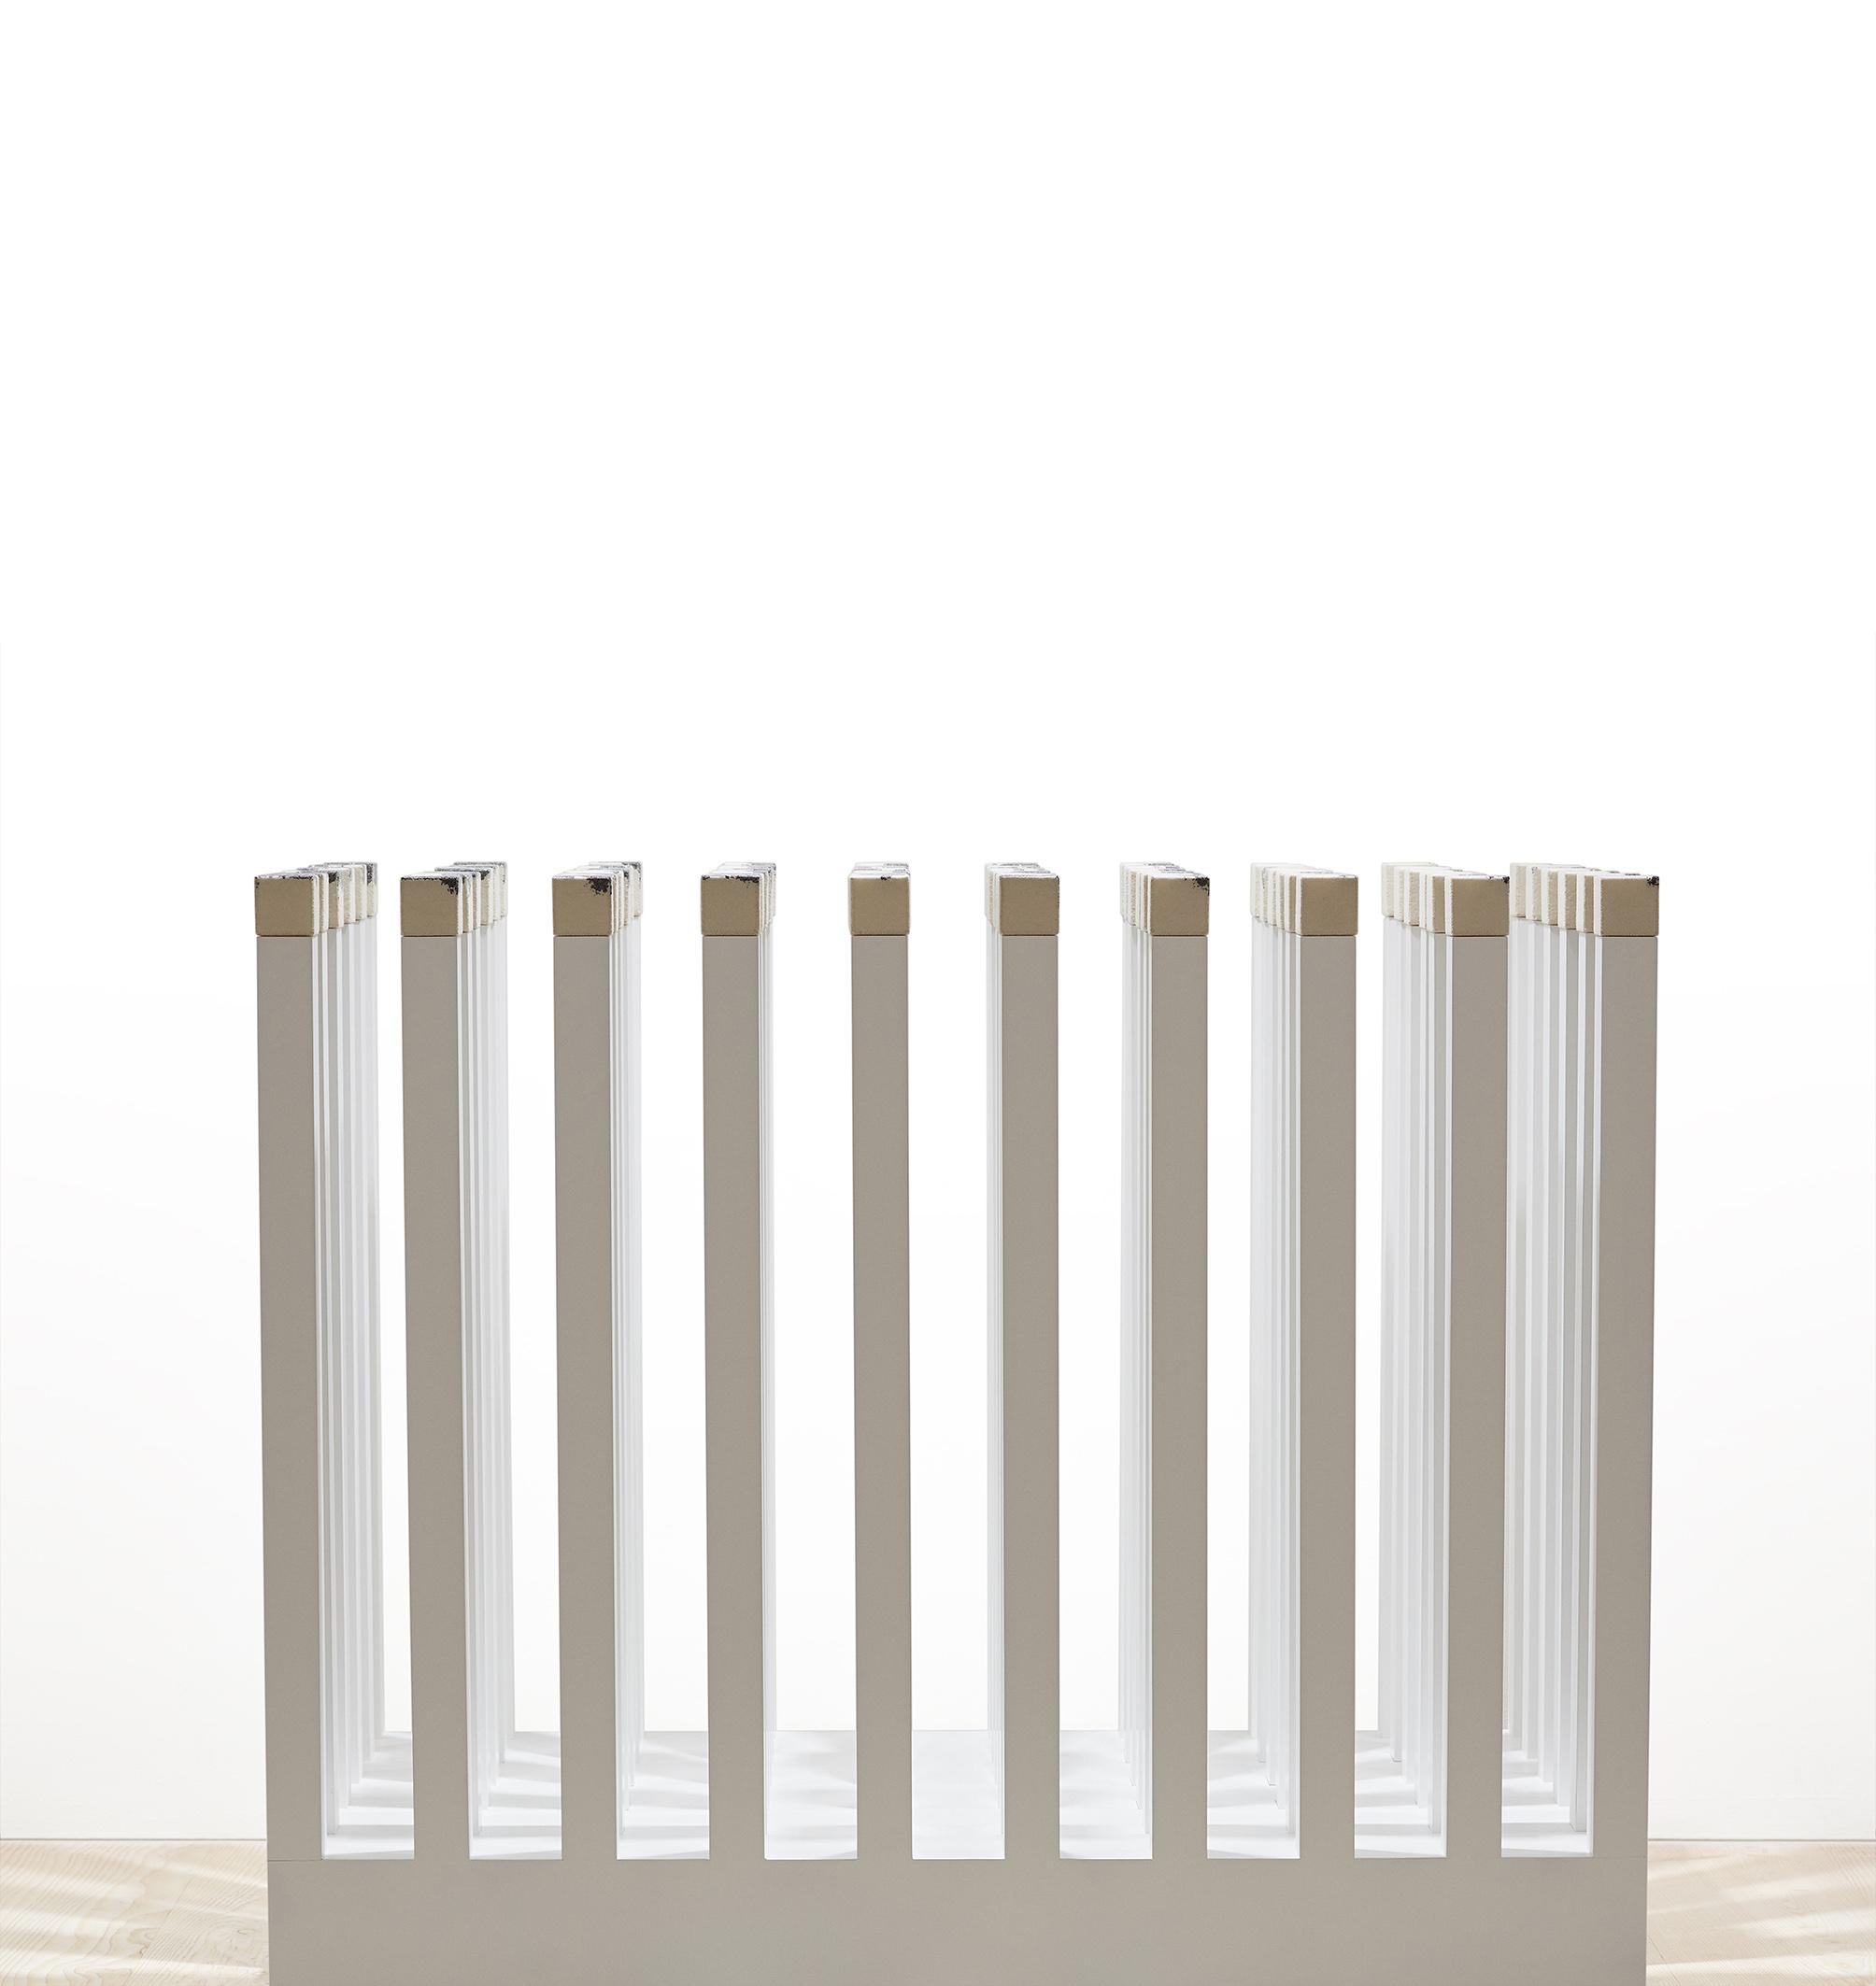 "Richard McVetis, United Kingdom ""Variations of a Stitched Cube"", wool, cotton, Styrofoam, MDF, 850 x 1500 x 1200 mm (2017)"